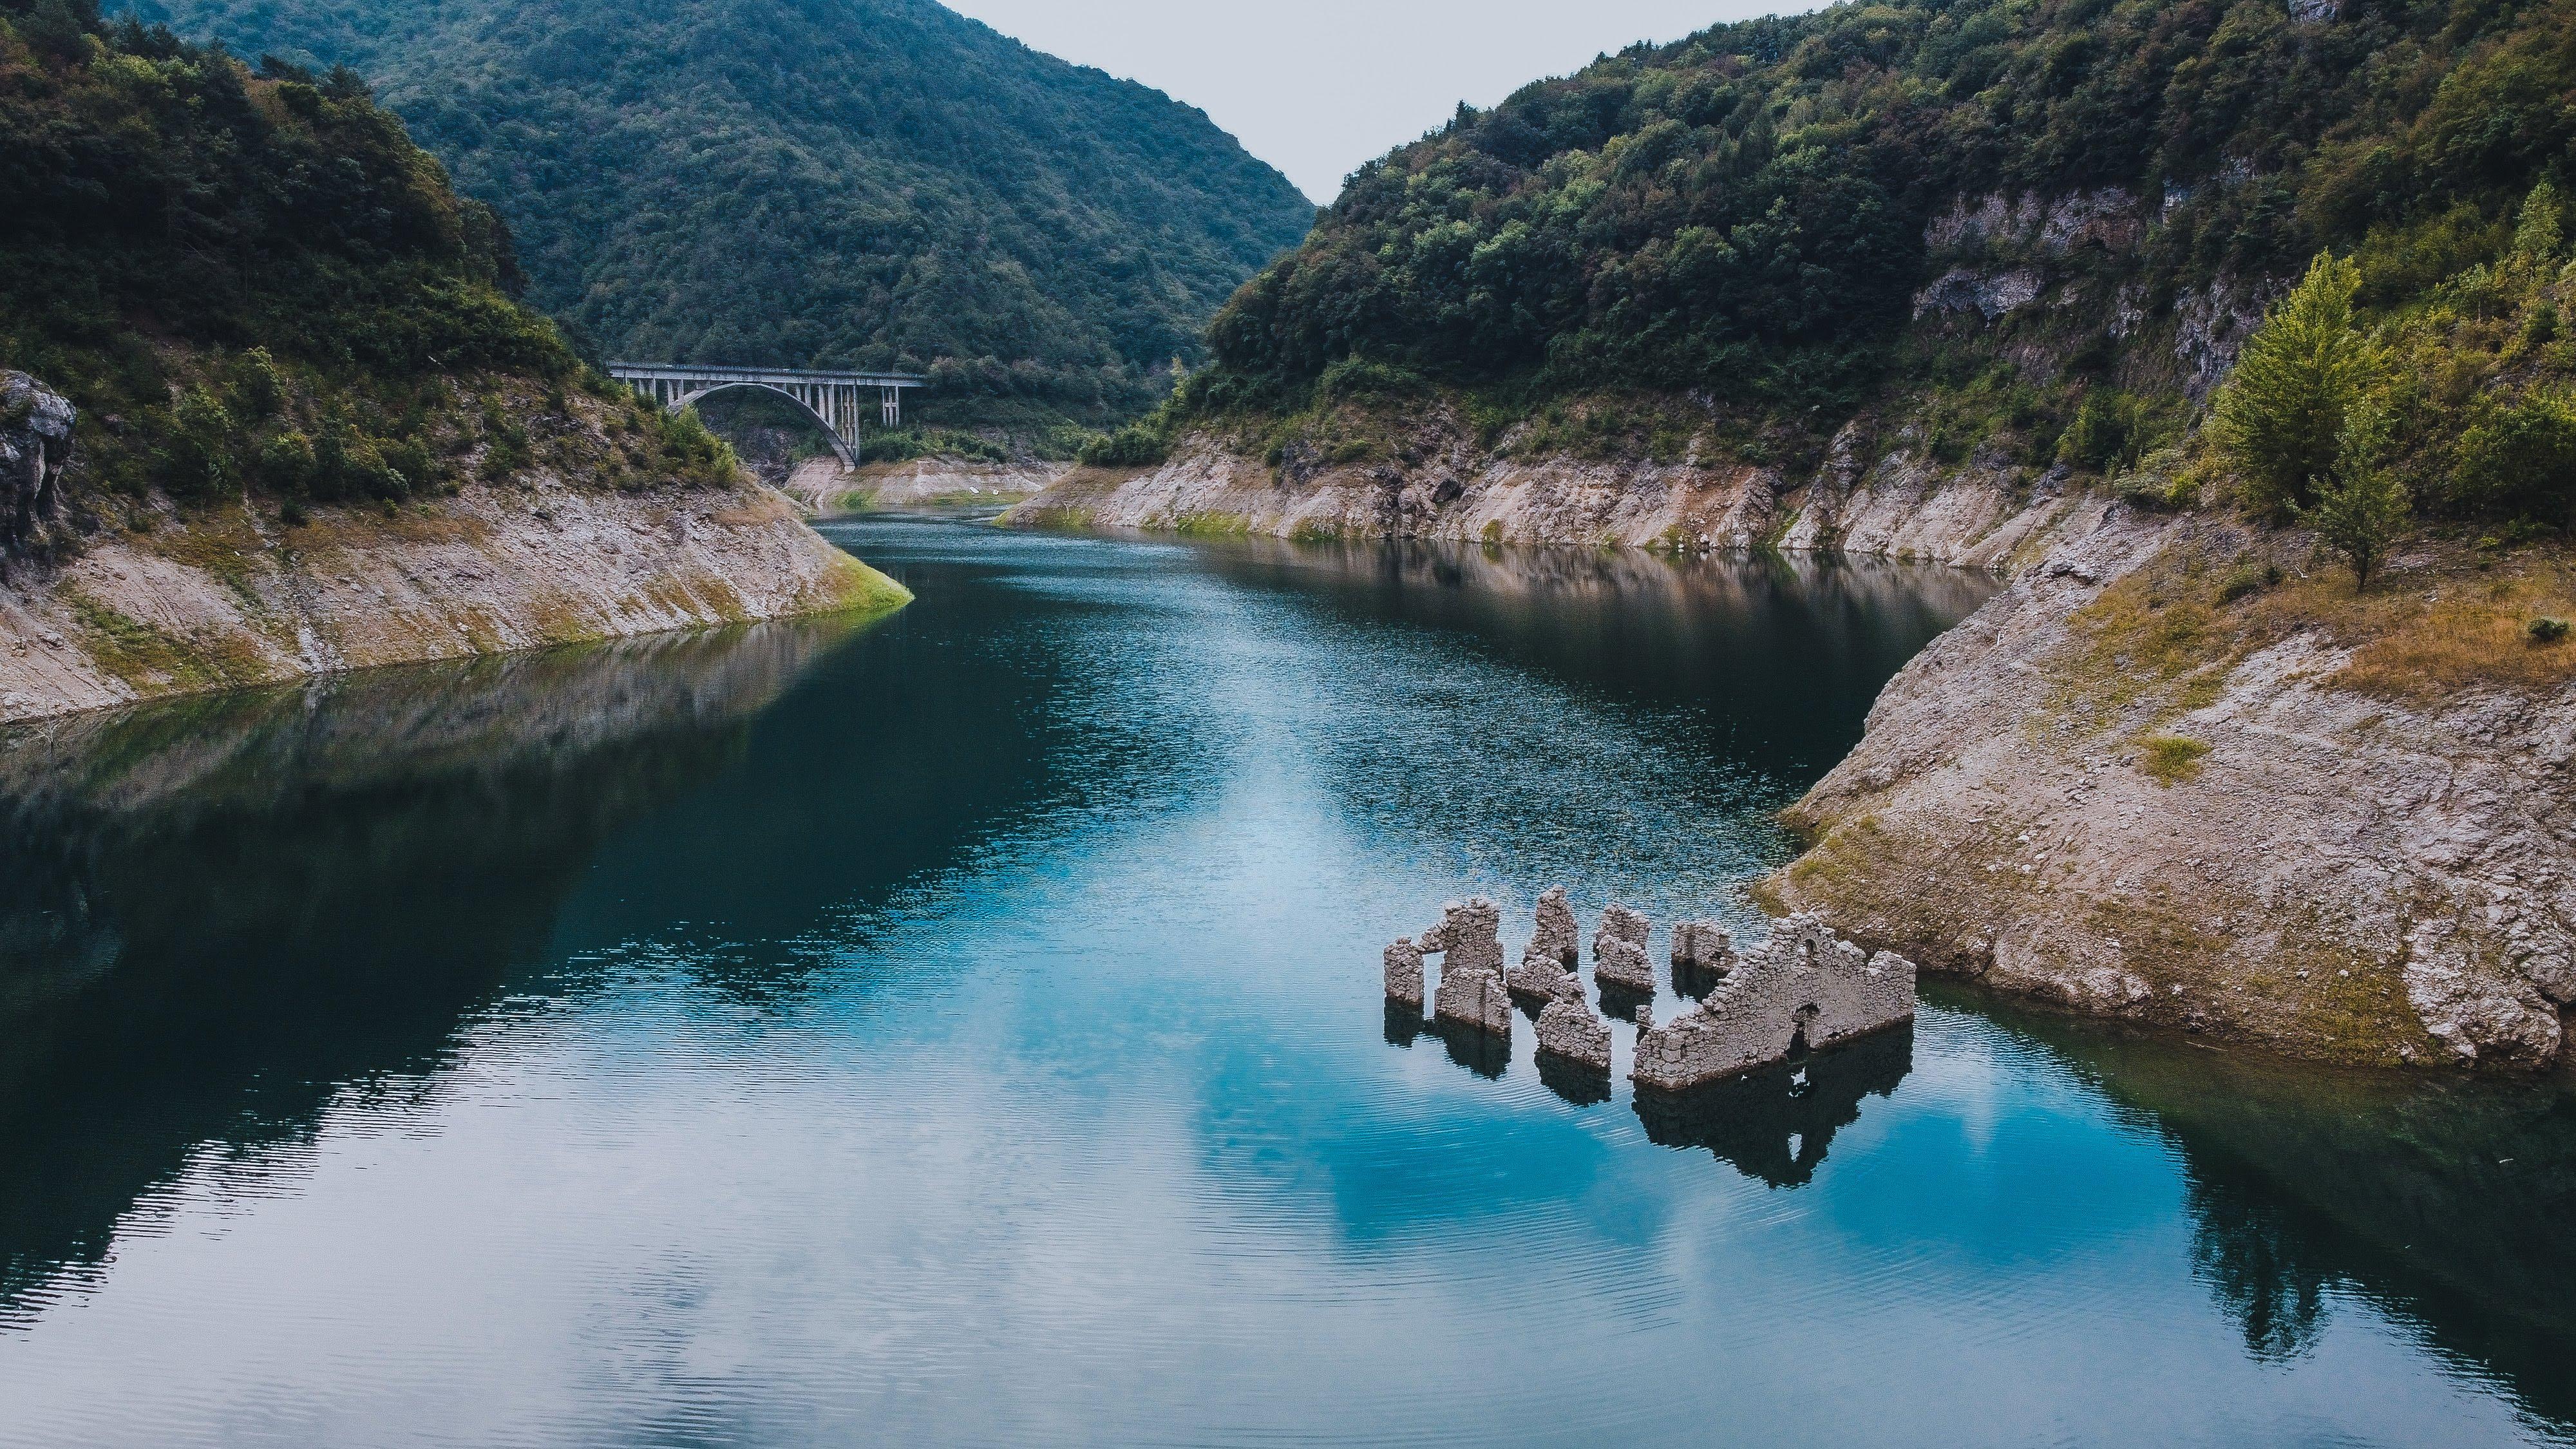 The dam and the Valvestino lake